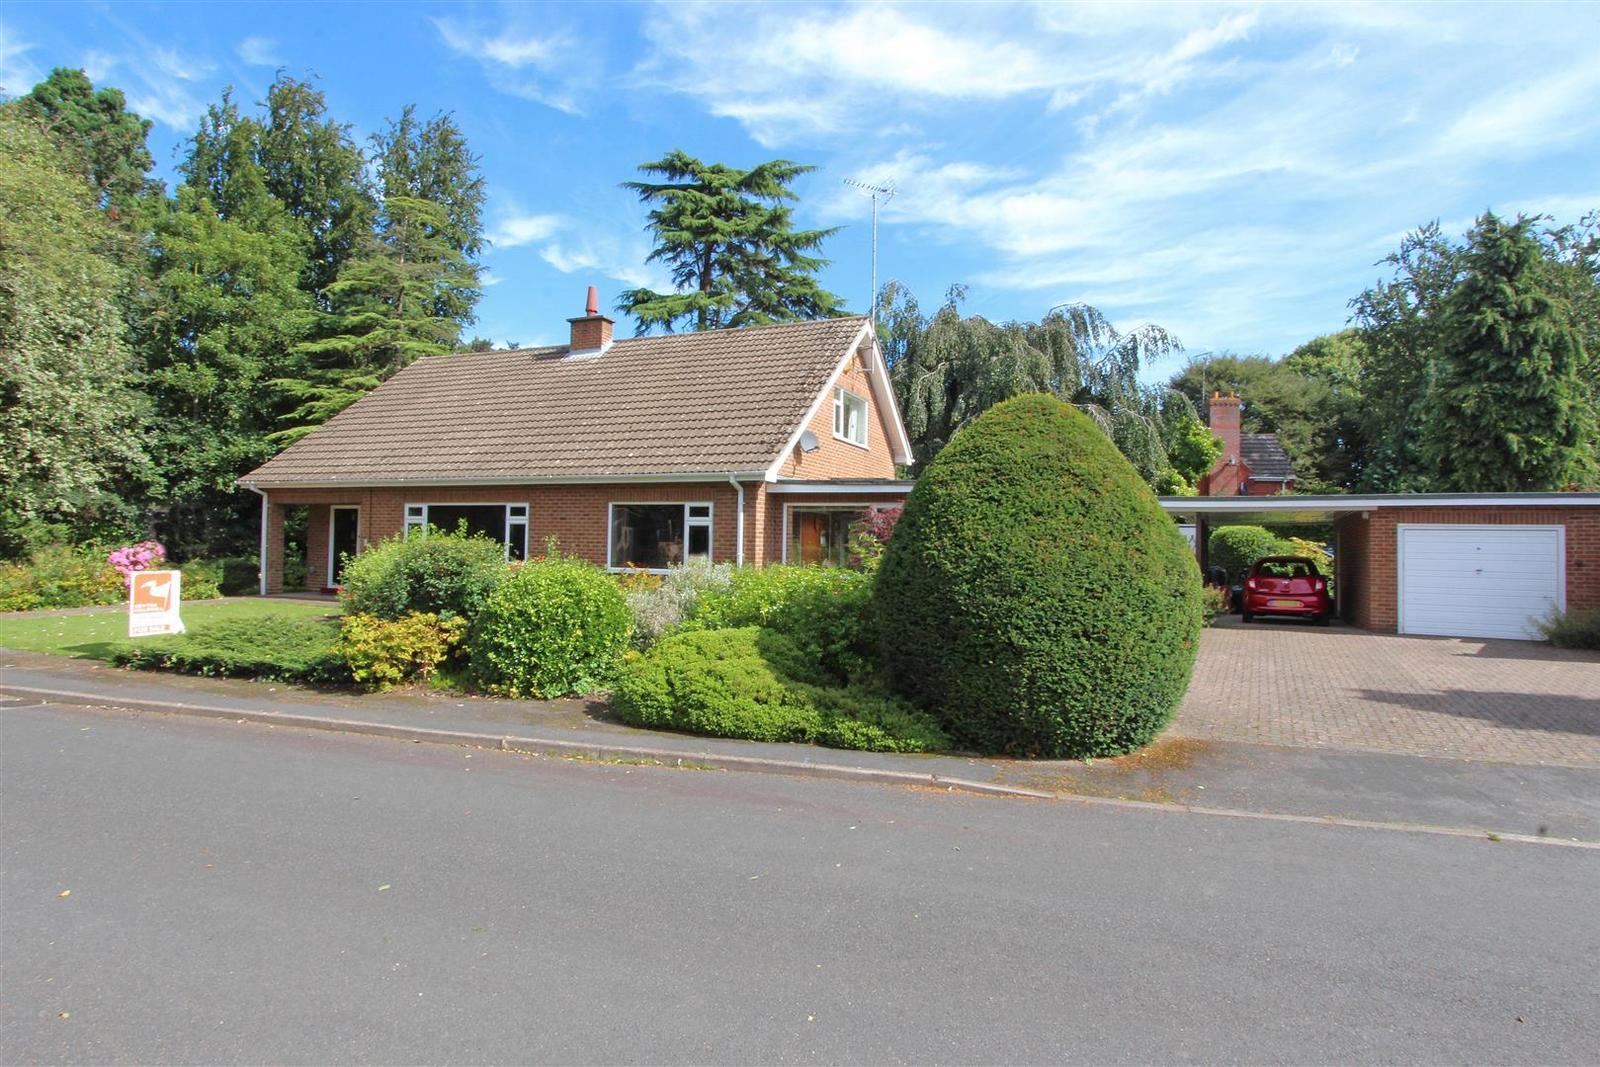 4 Bedrooms Property for sale in Beechfield Gardens, Spalding